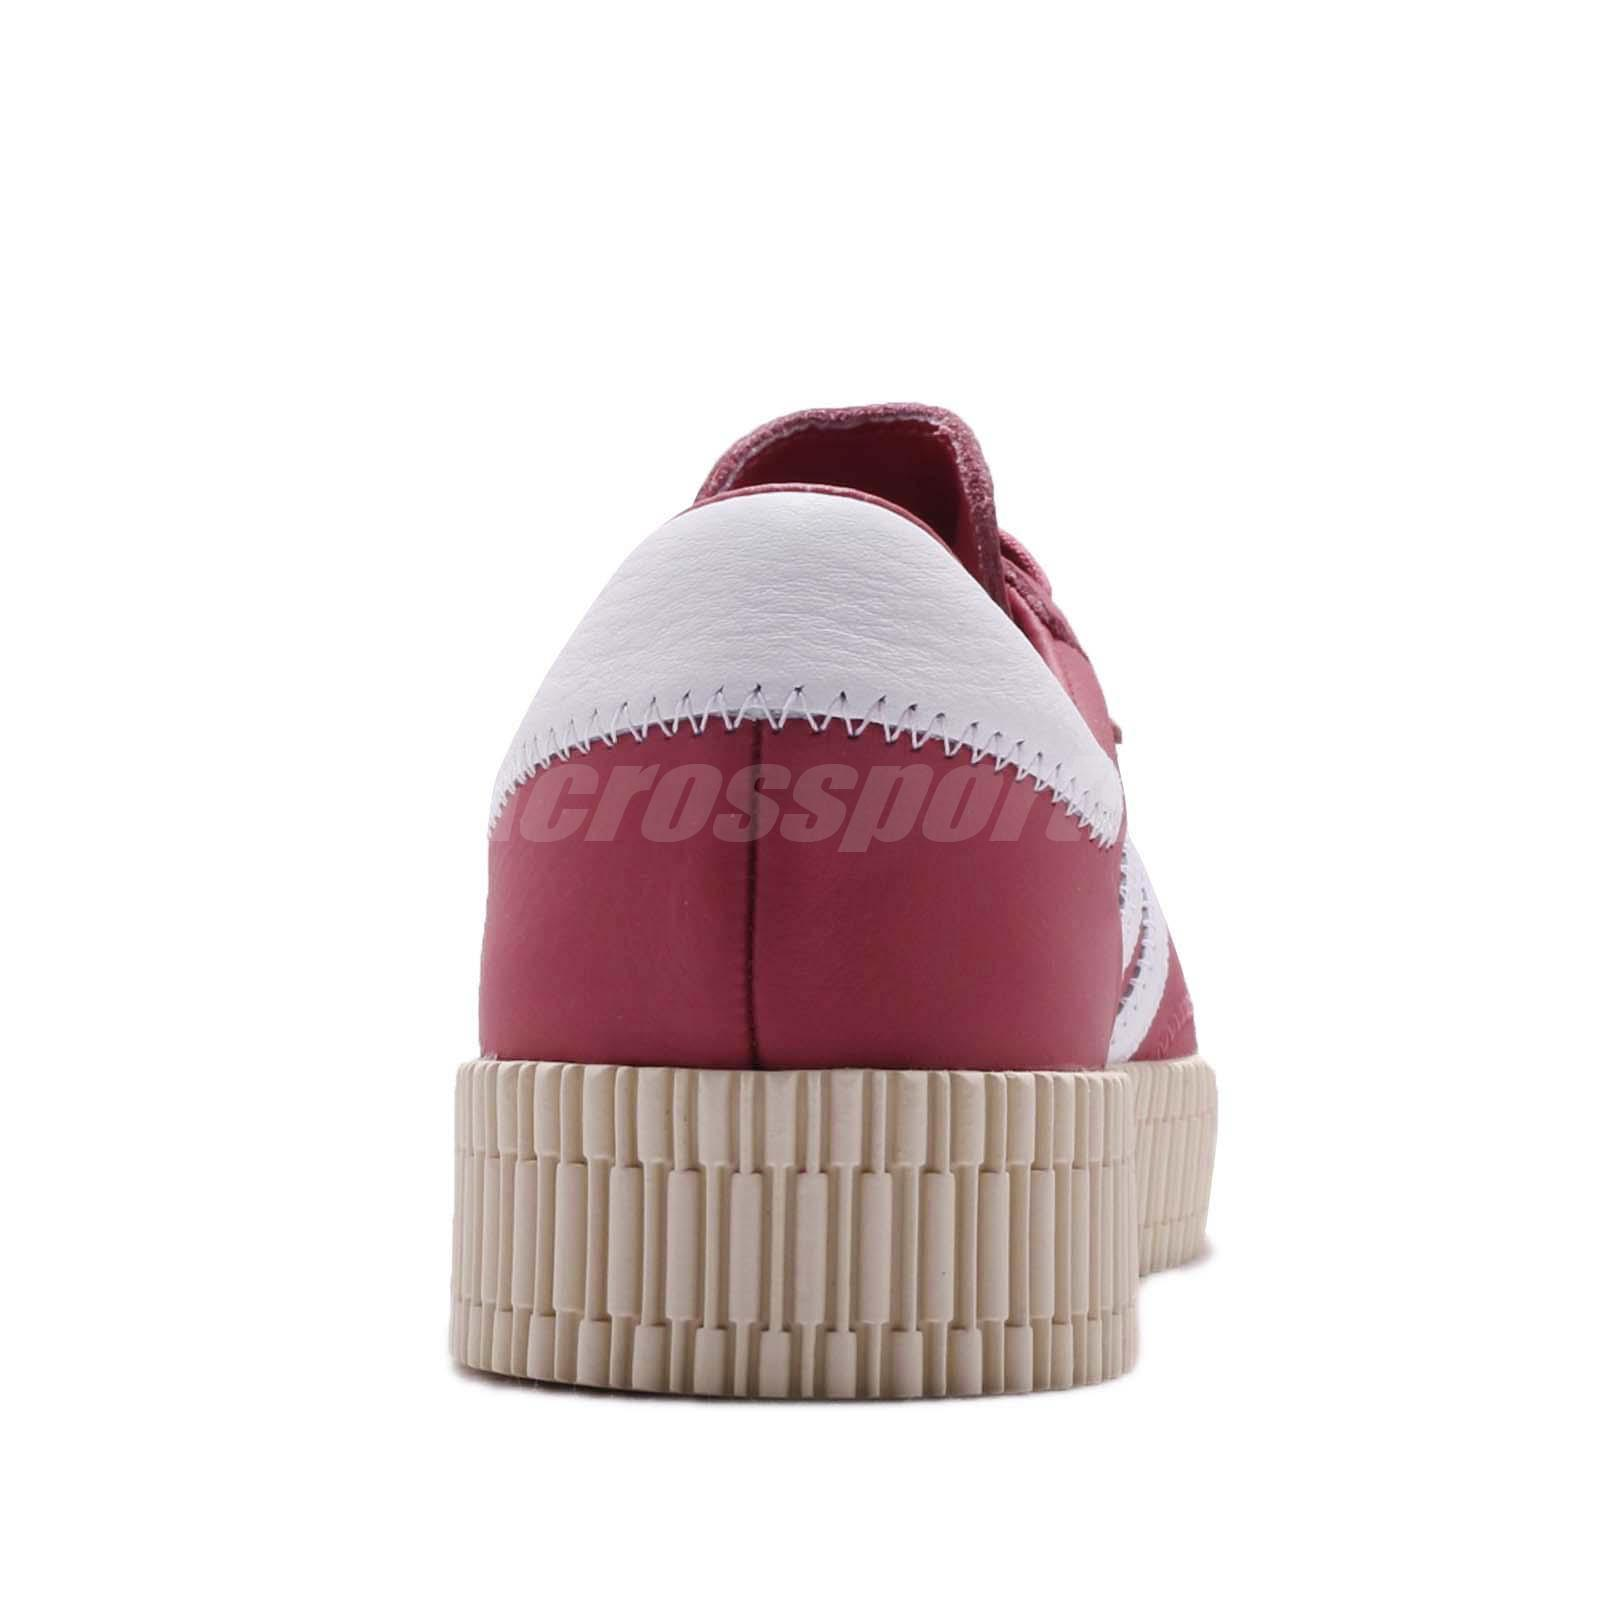 adidas Originals Sambarose W Trace Maroon White Women Platform Shoes ... 4b151dc4f29